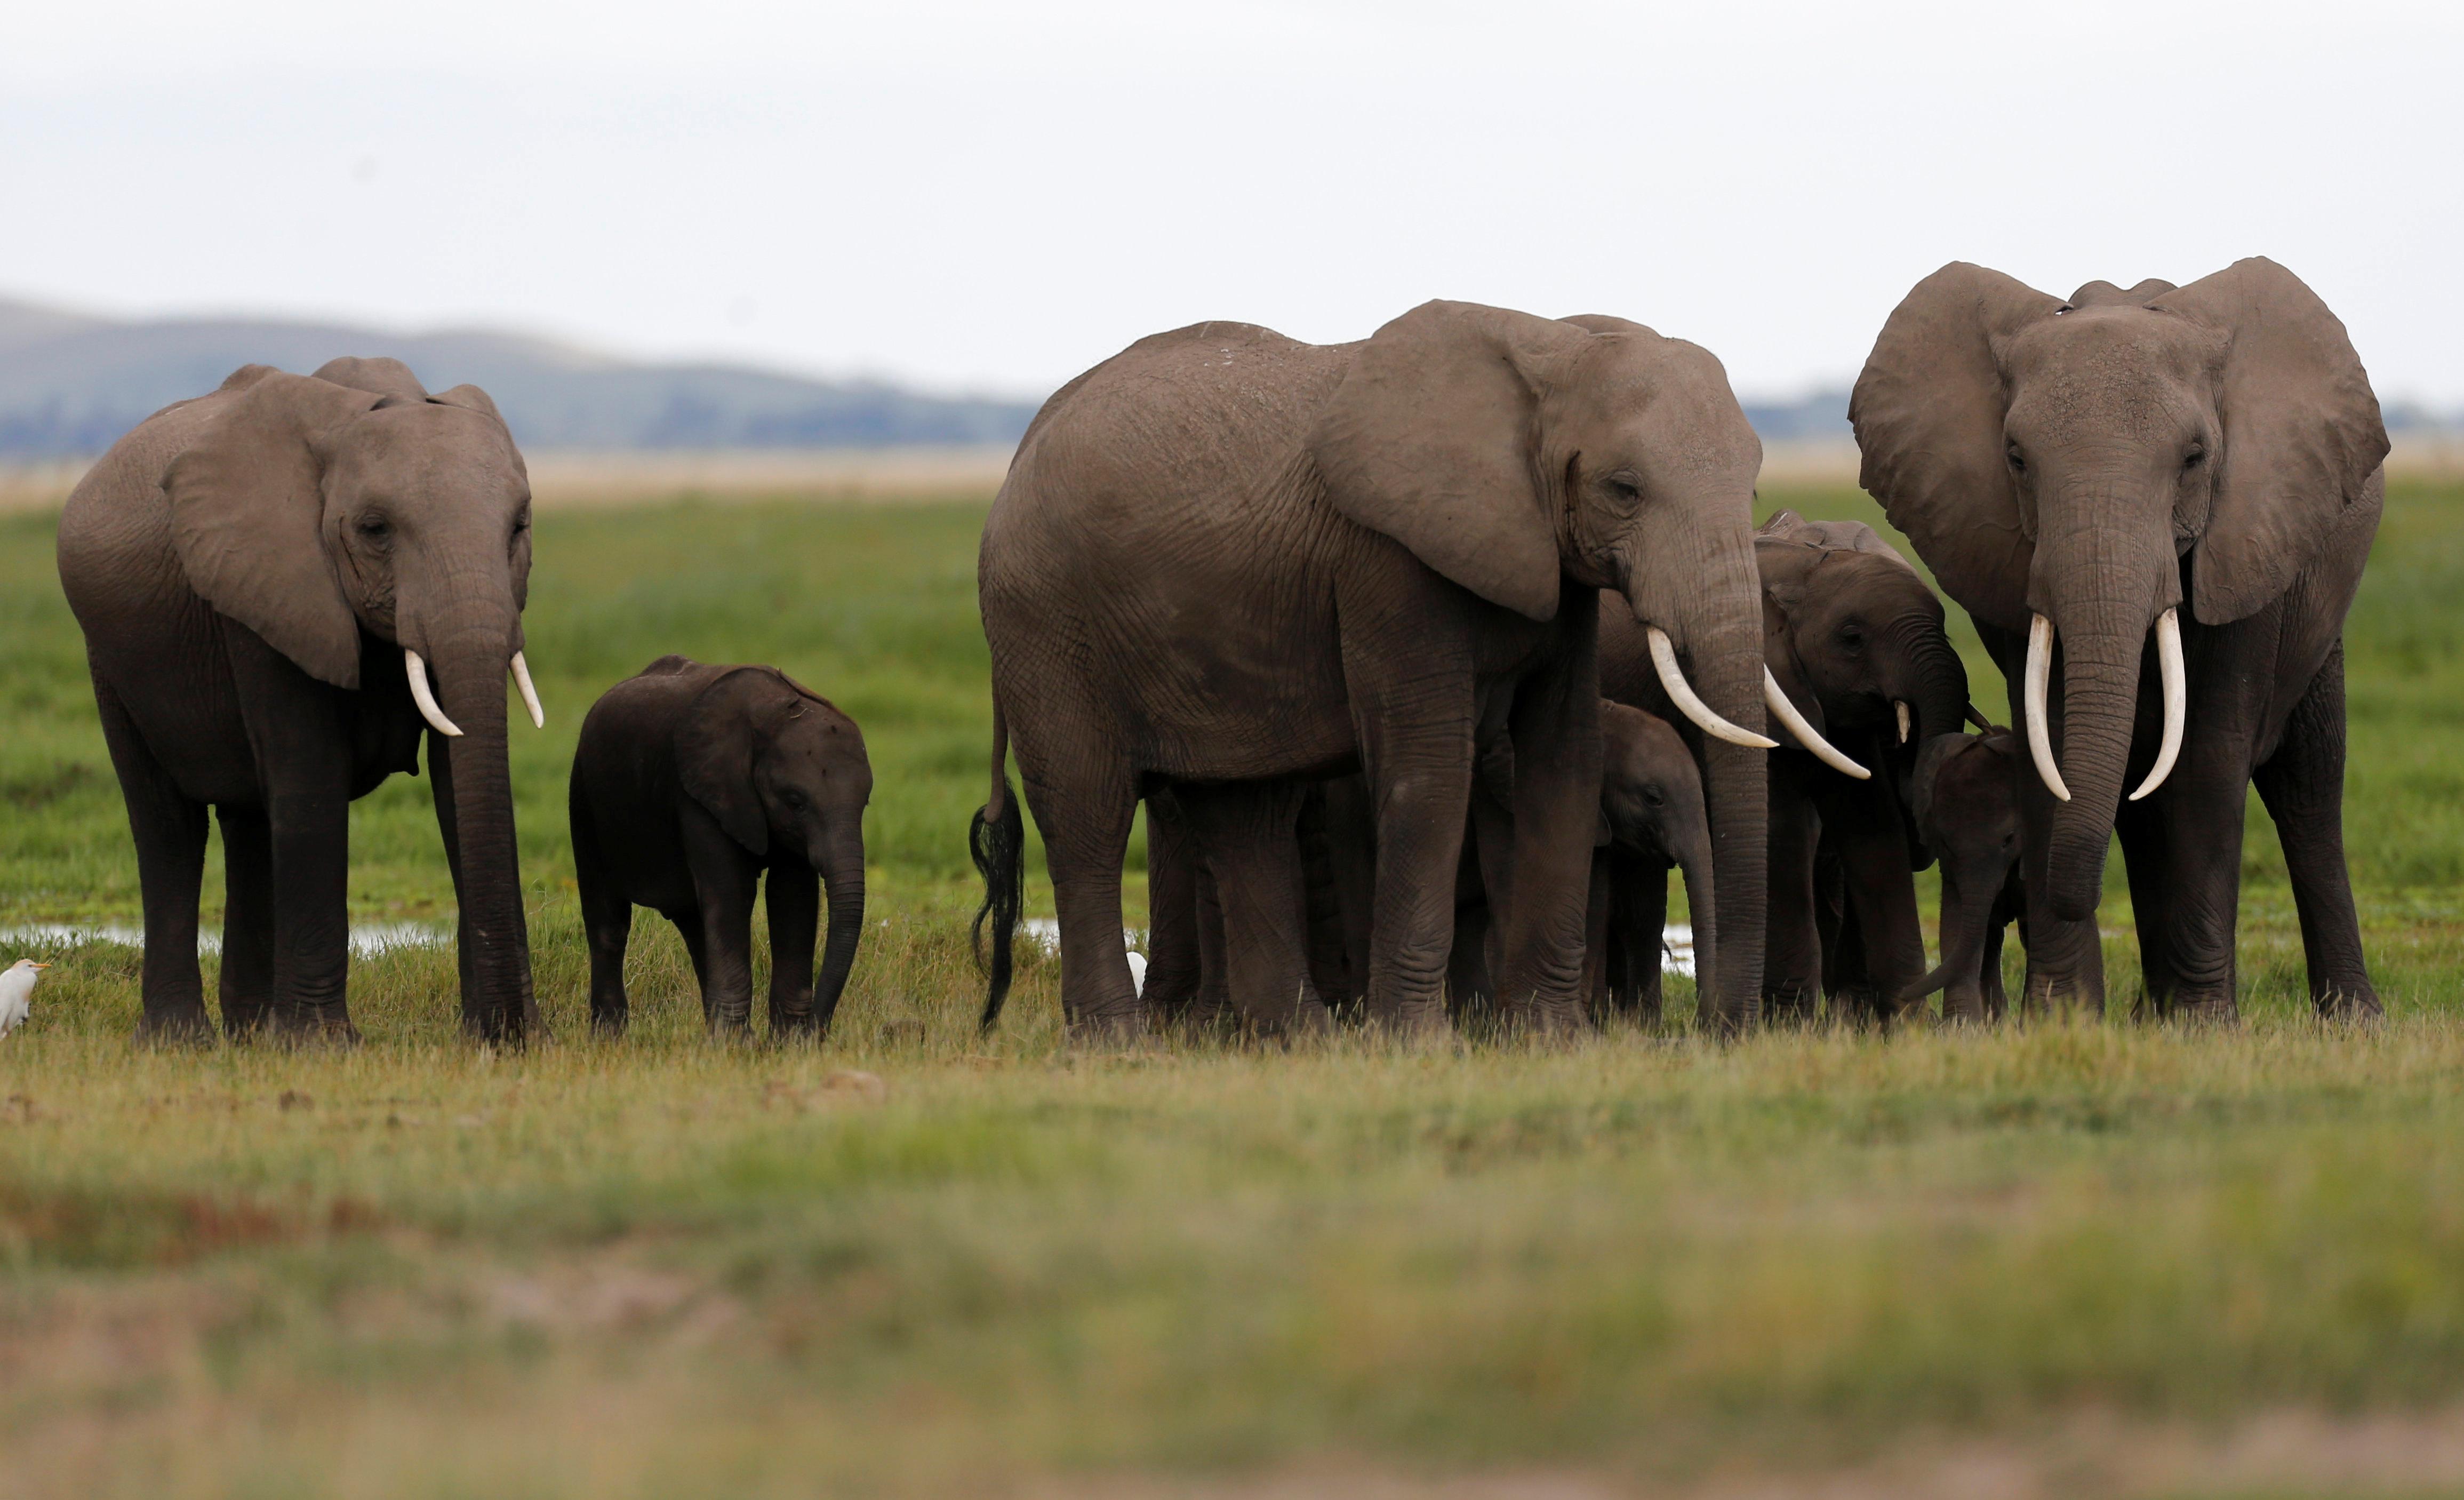 A family of elephants walk in Amboseli National Park, southeast of Kenya's capital Nairobi